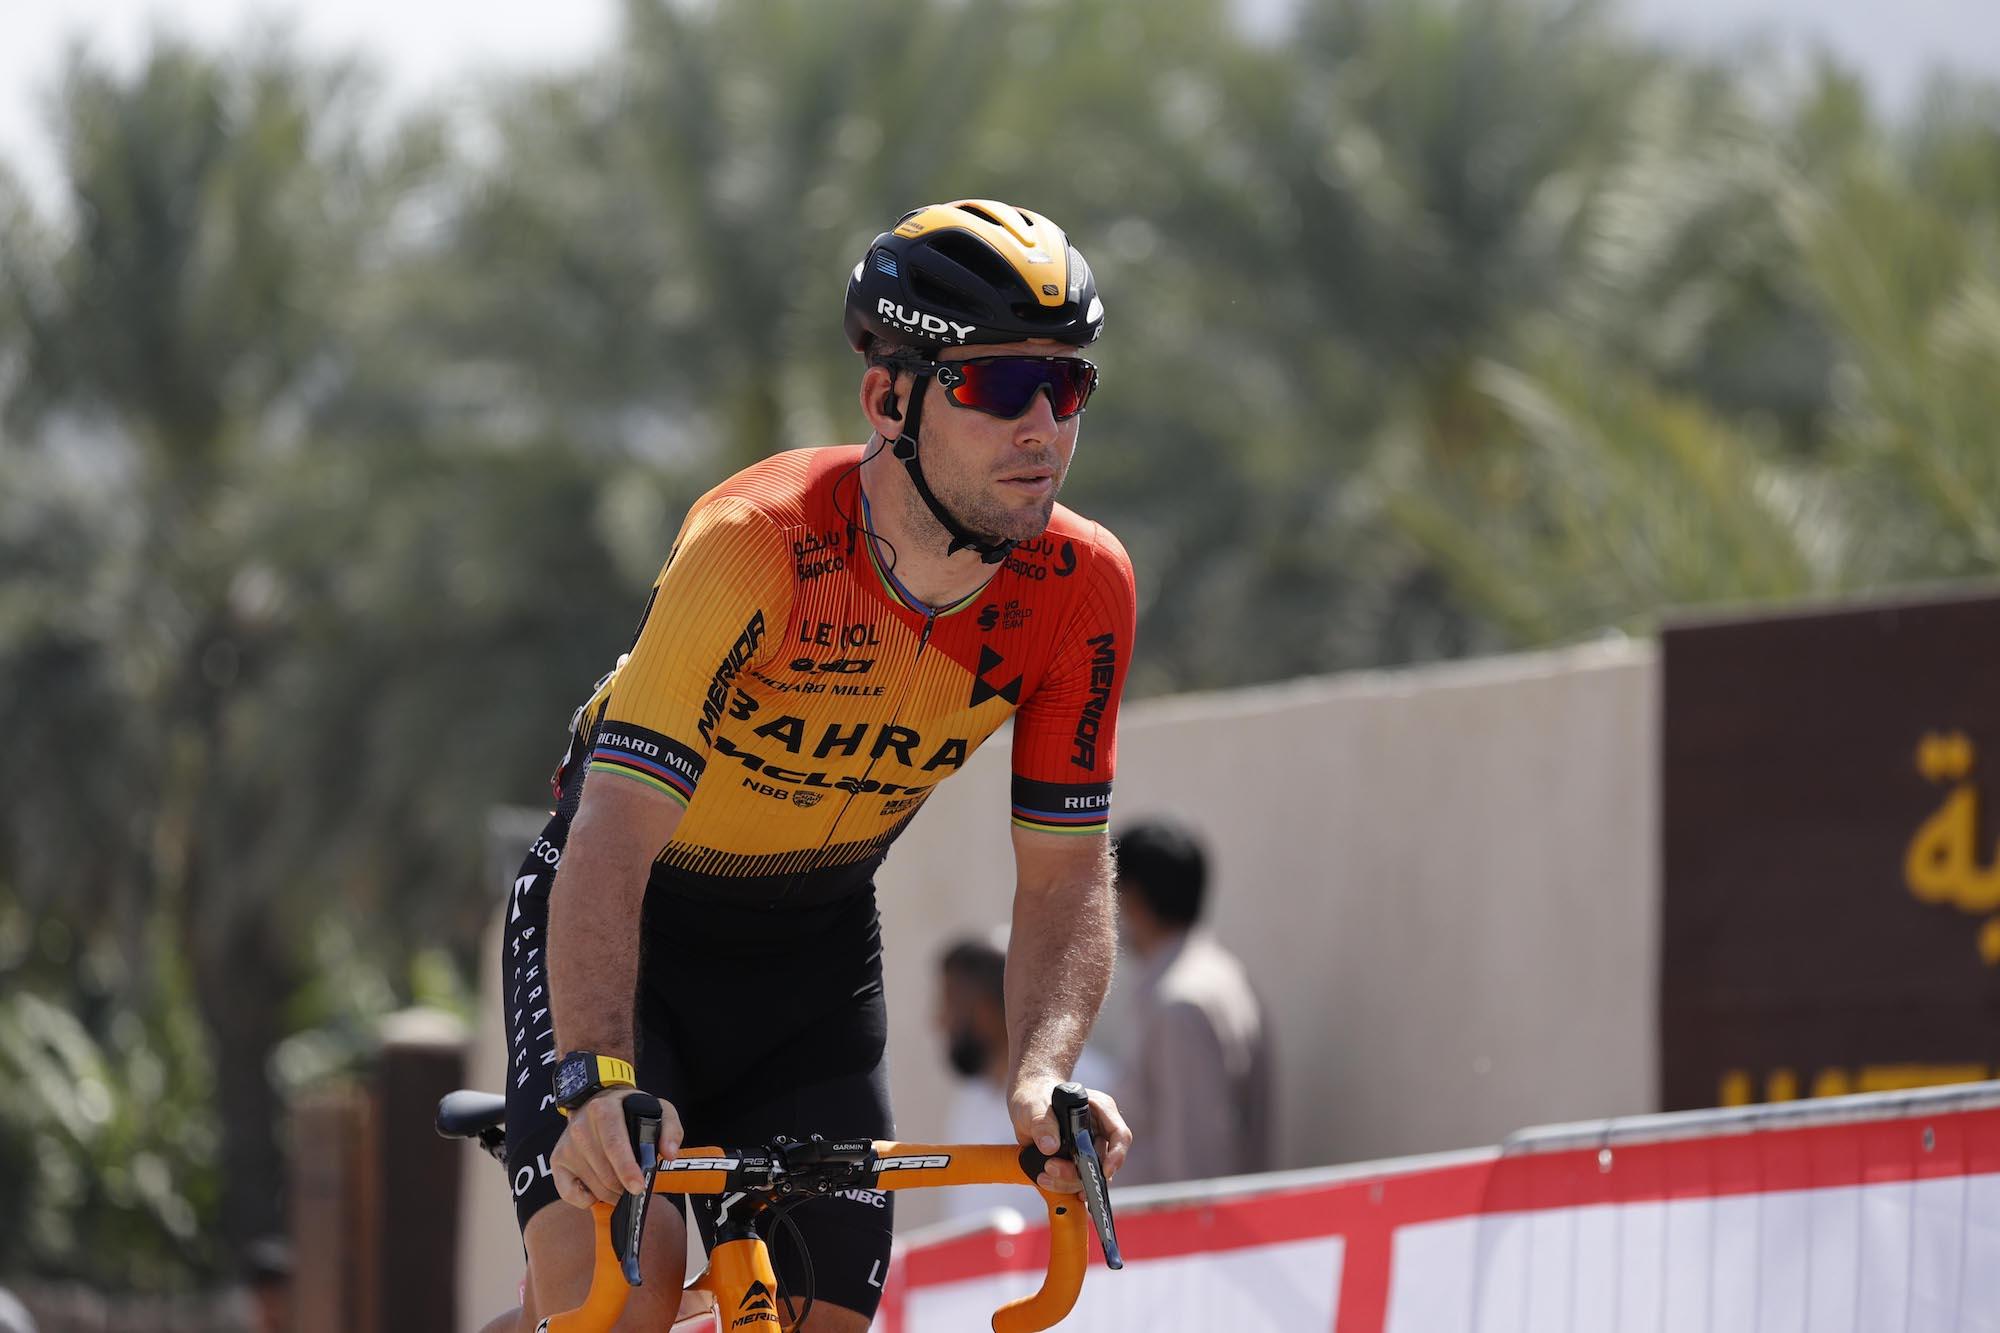 Mark Cavendish vuelve a las carreras de un día Scheldeprijs y Ghent-Wevelgem